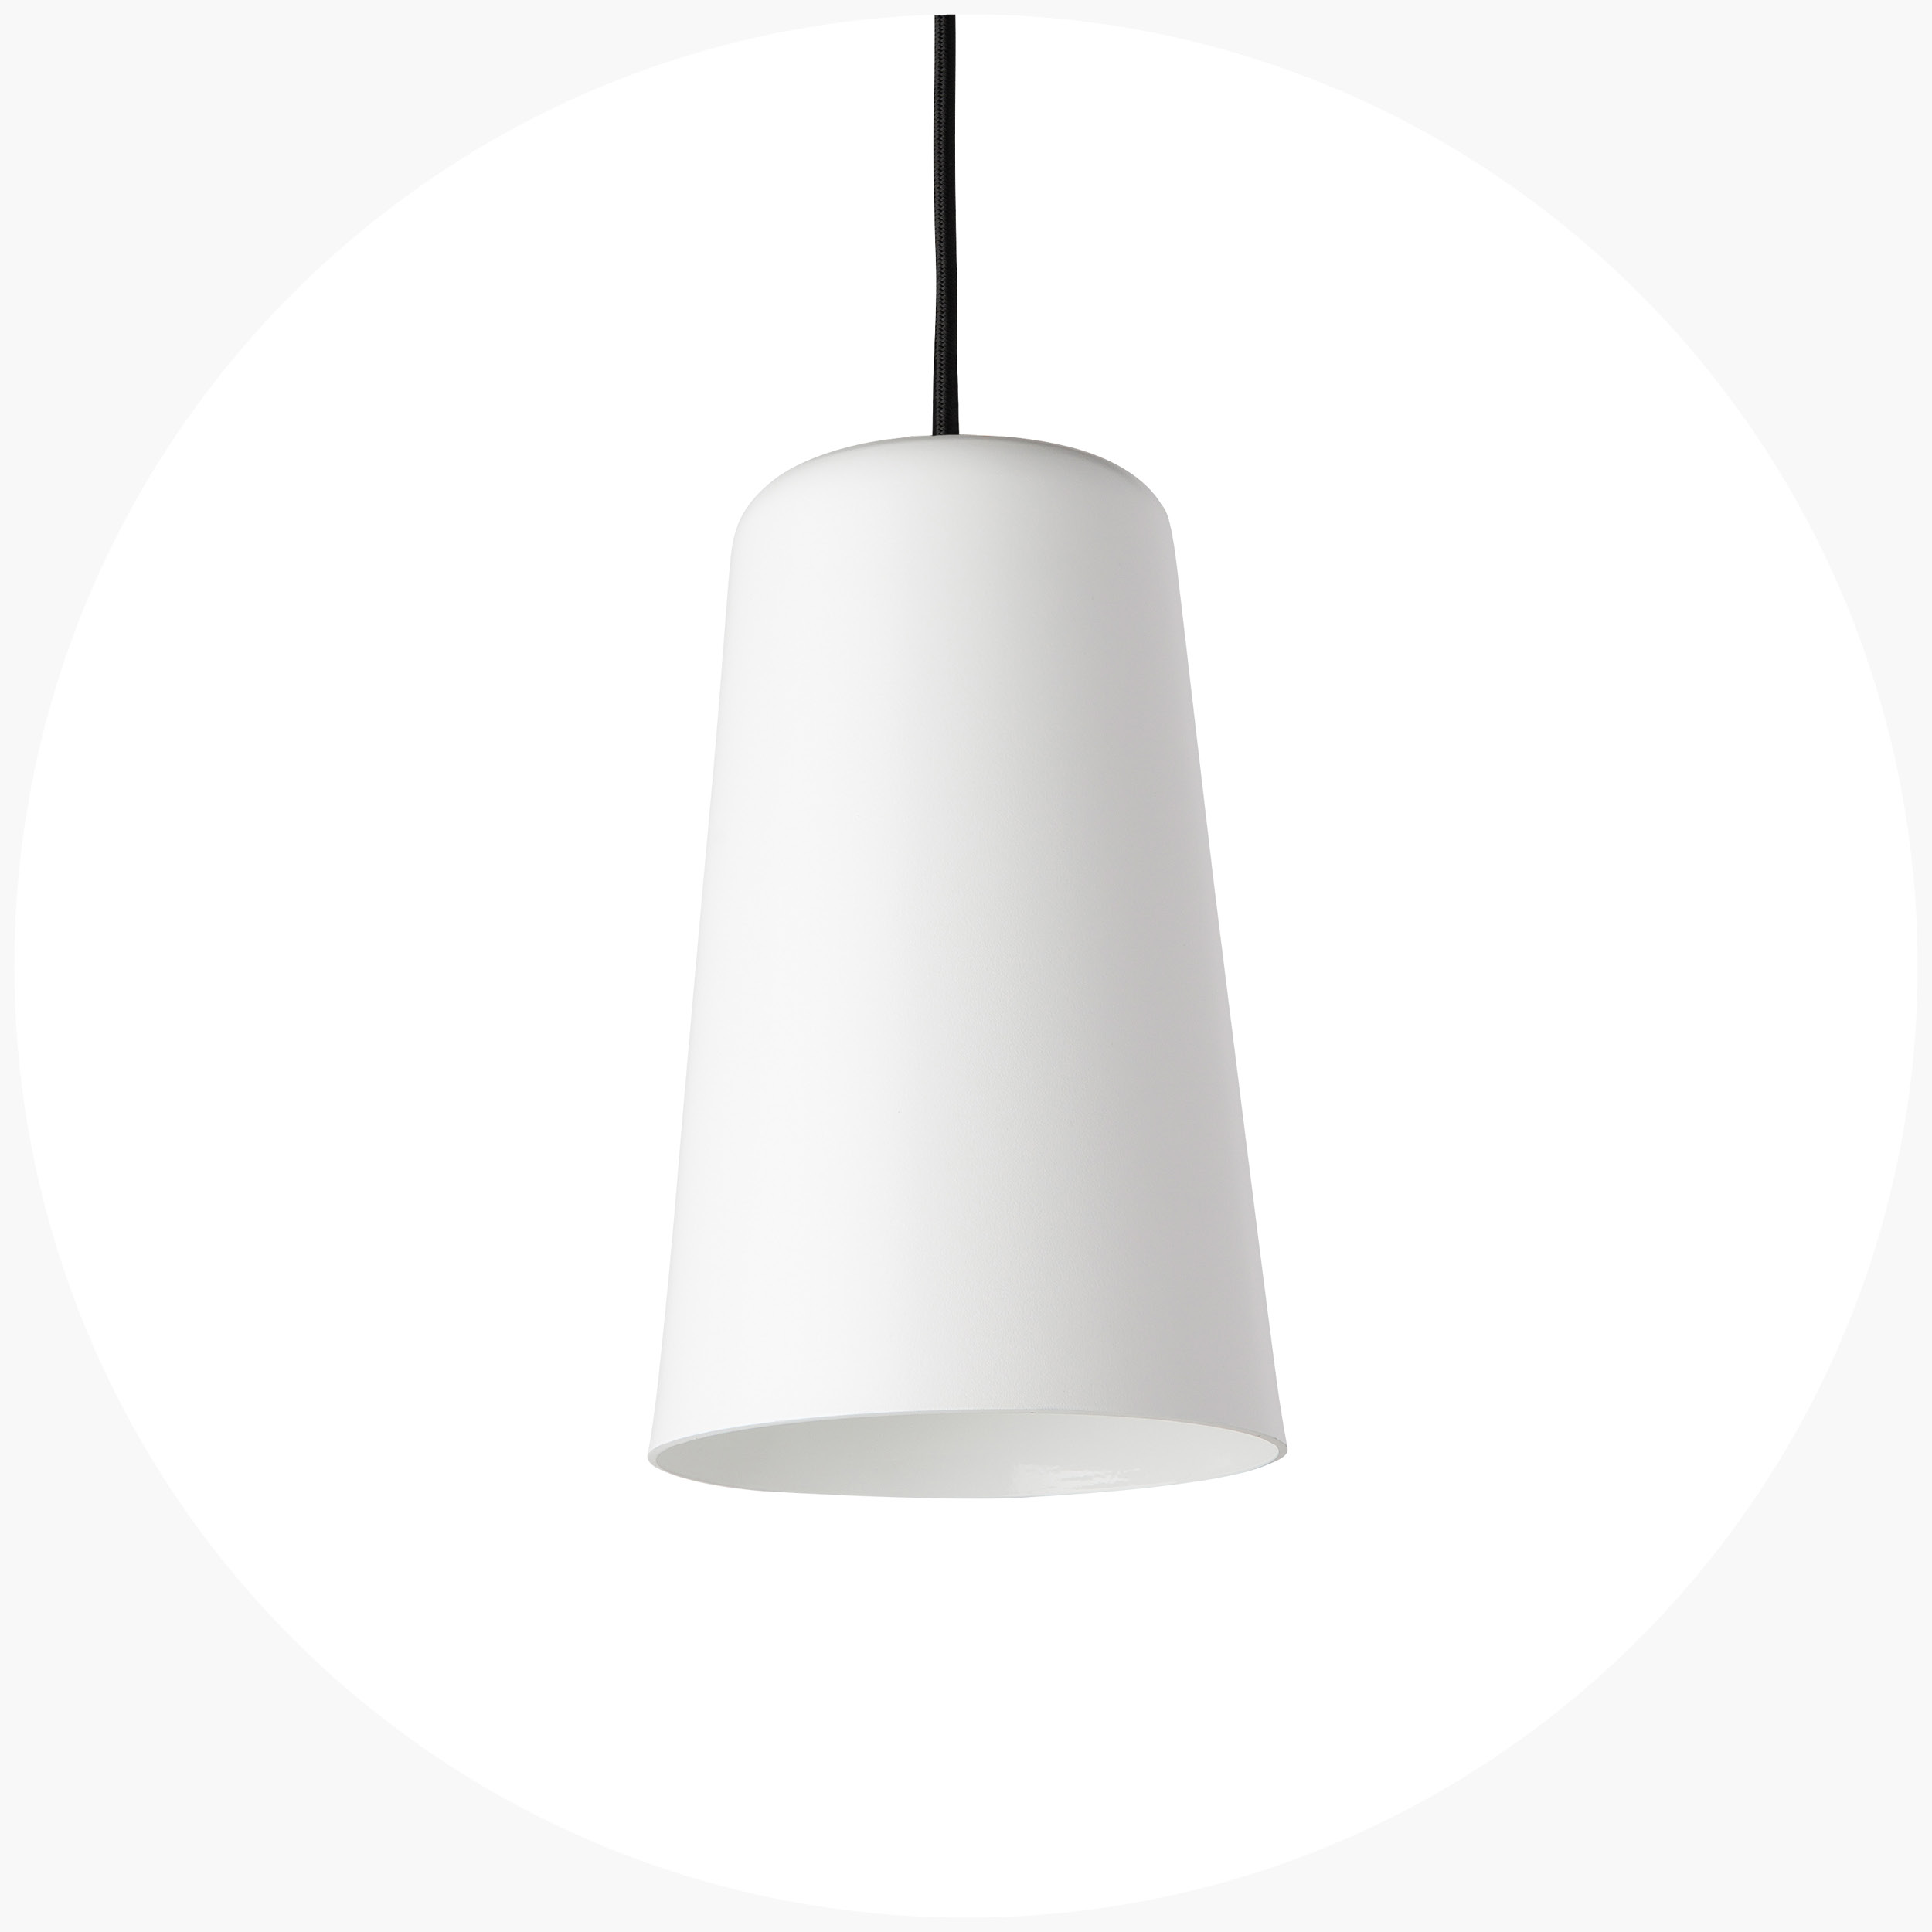 Contrast Light Shade   $159.00